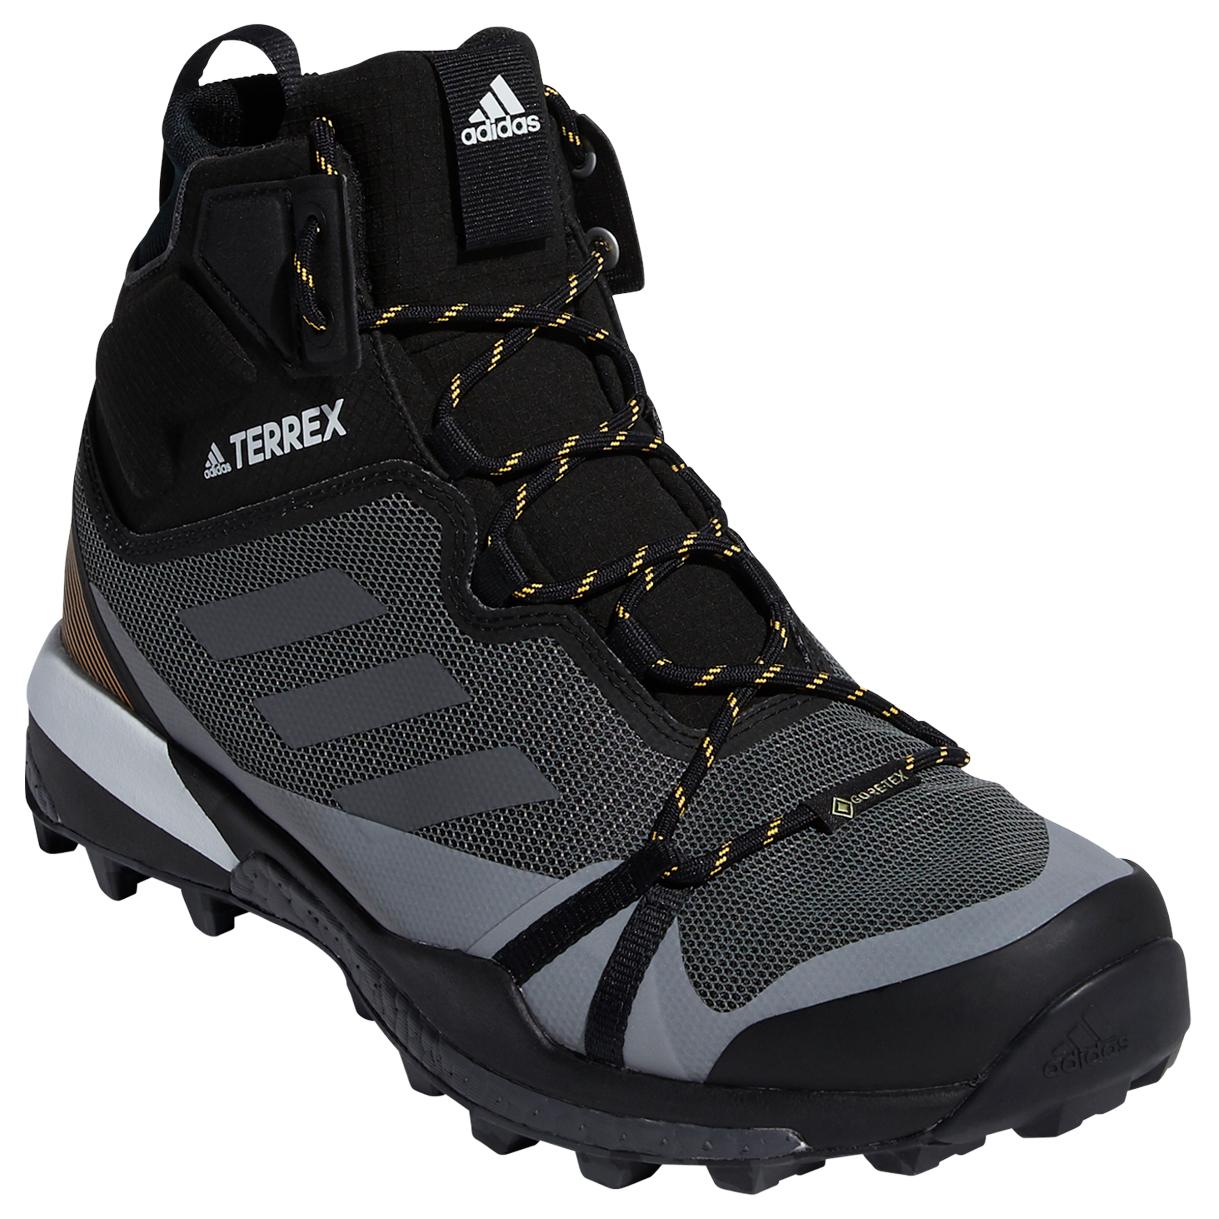 Adidas Terrex Skychaser LT Mid GTX